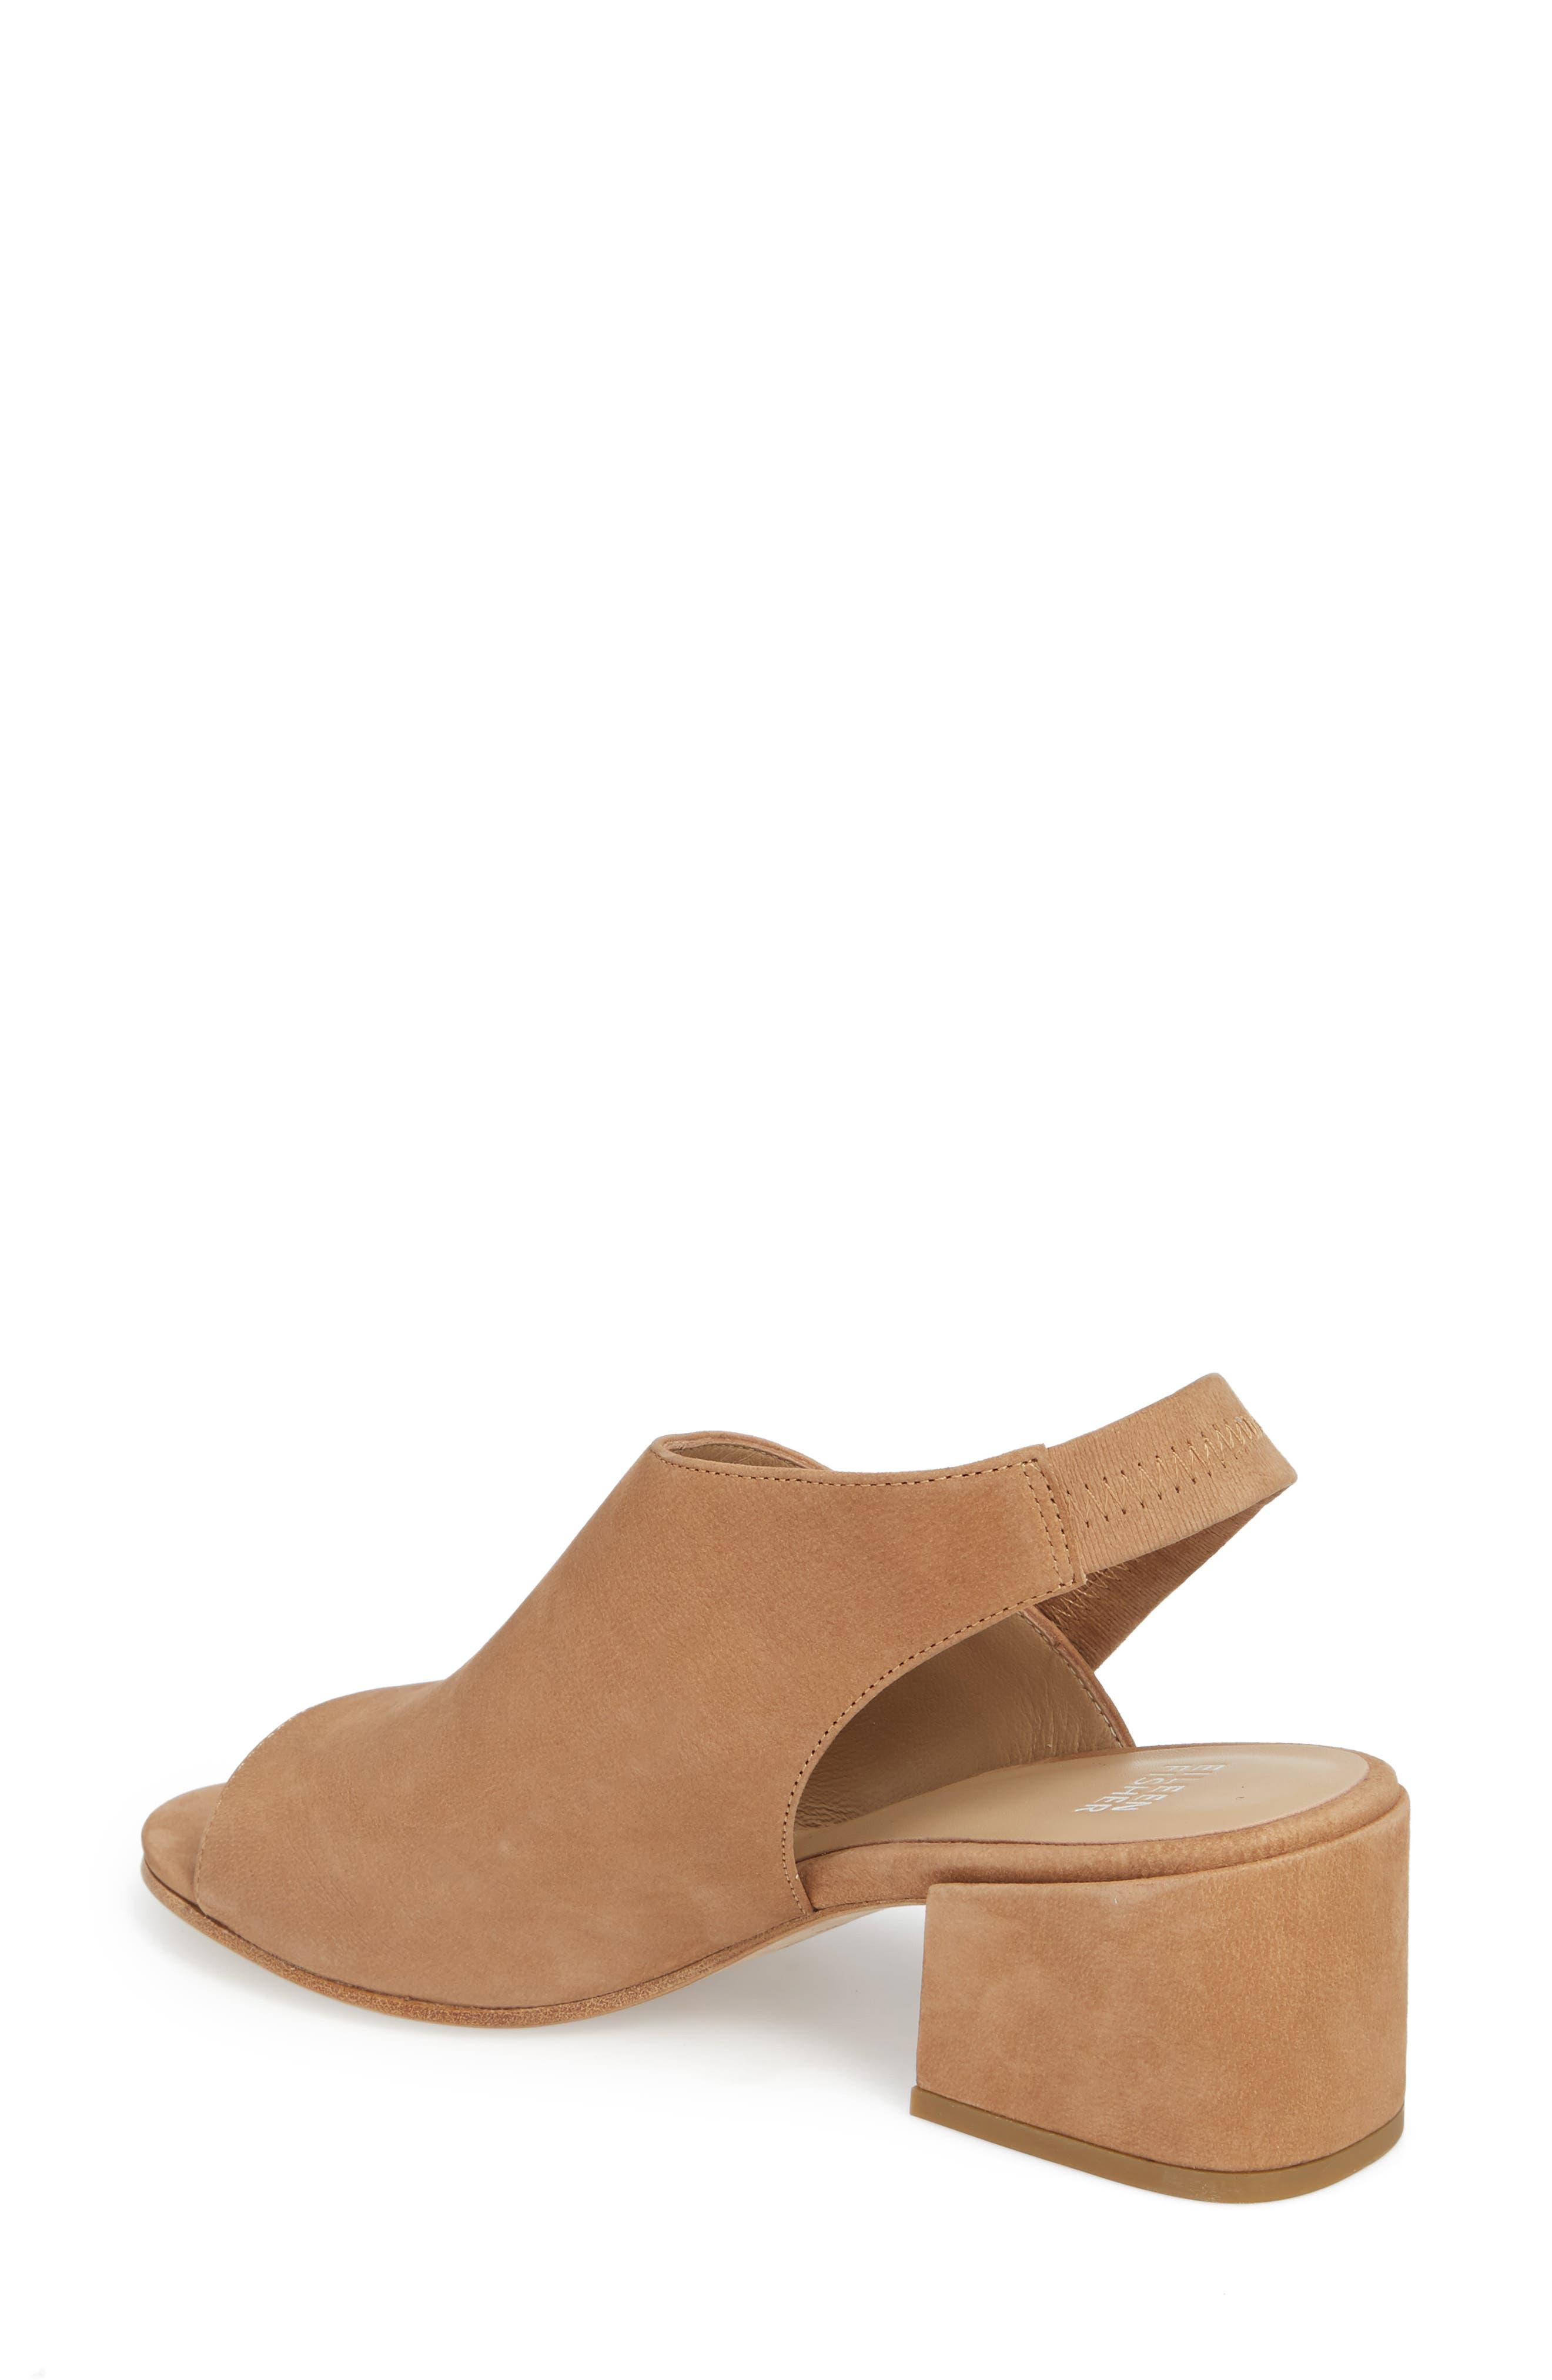 Leigh Asymmetrical Slingback Sandal,                             Alternate thumbnail 5, color,